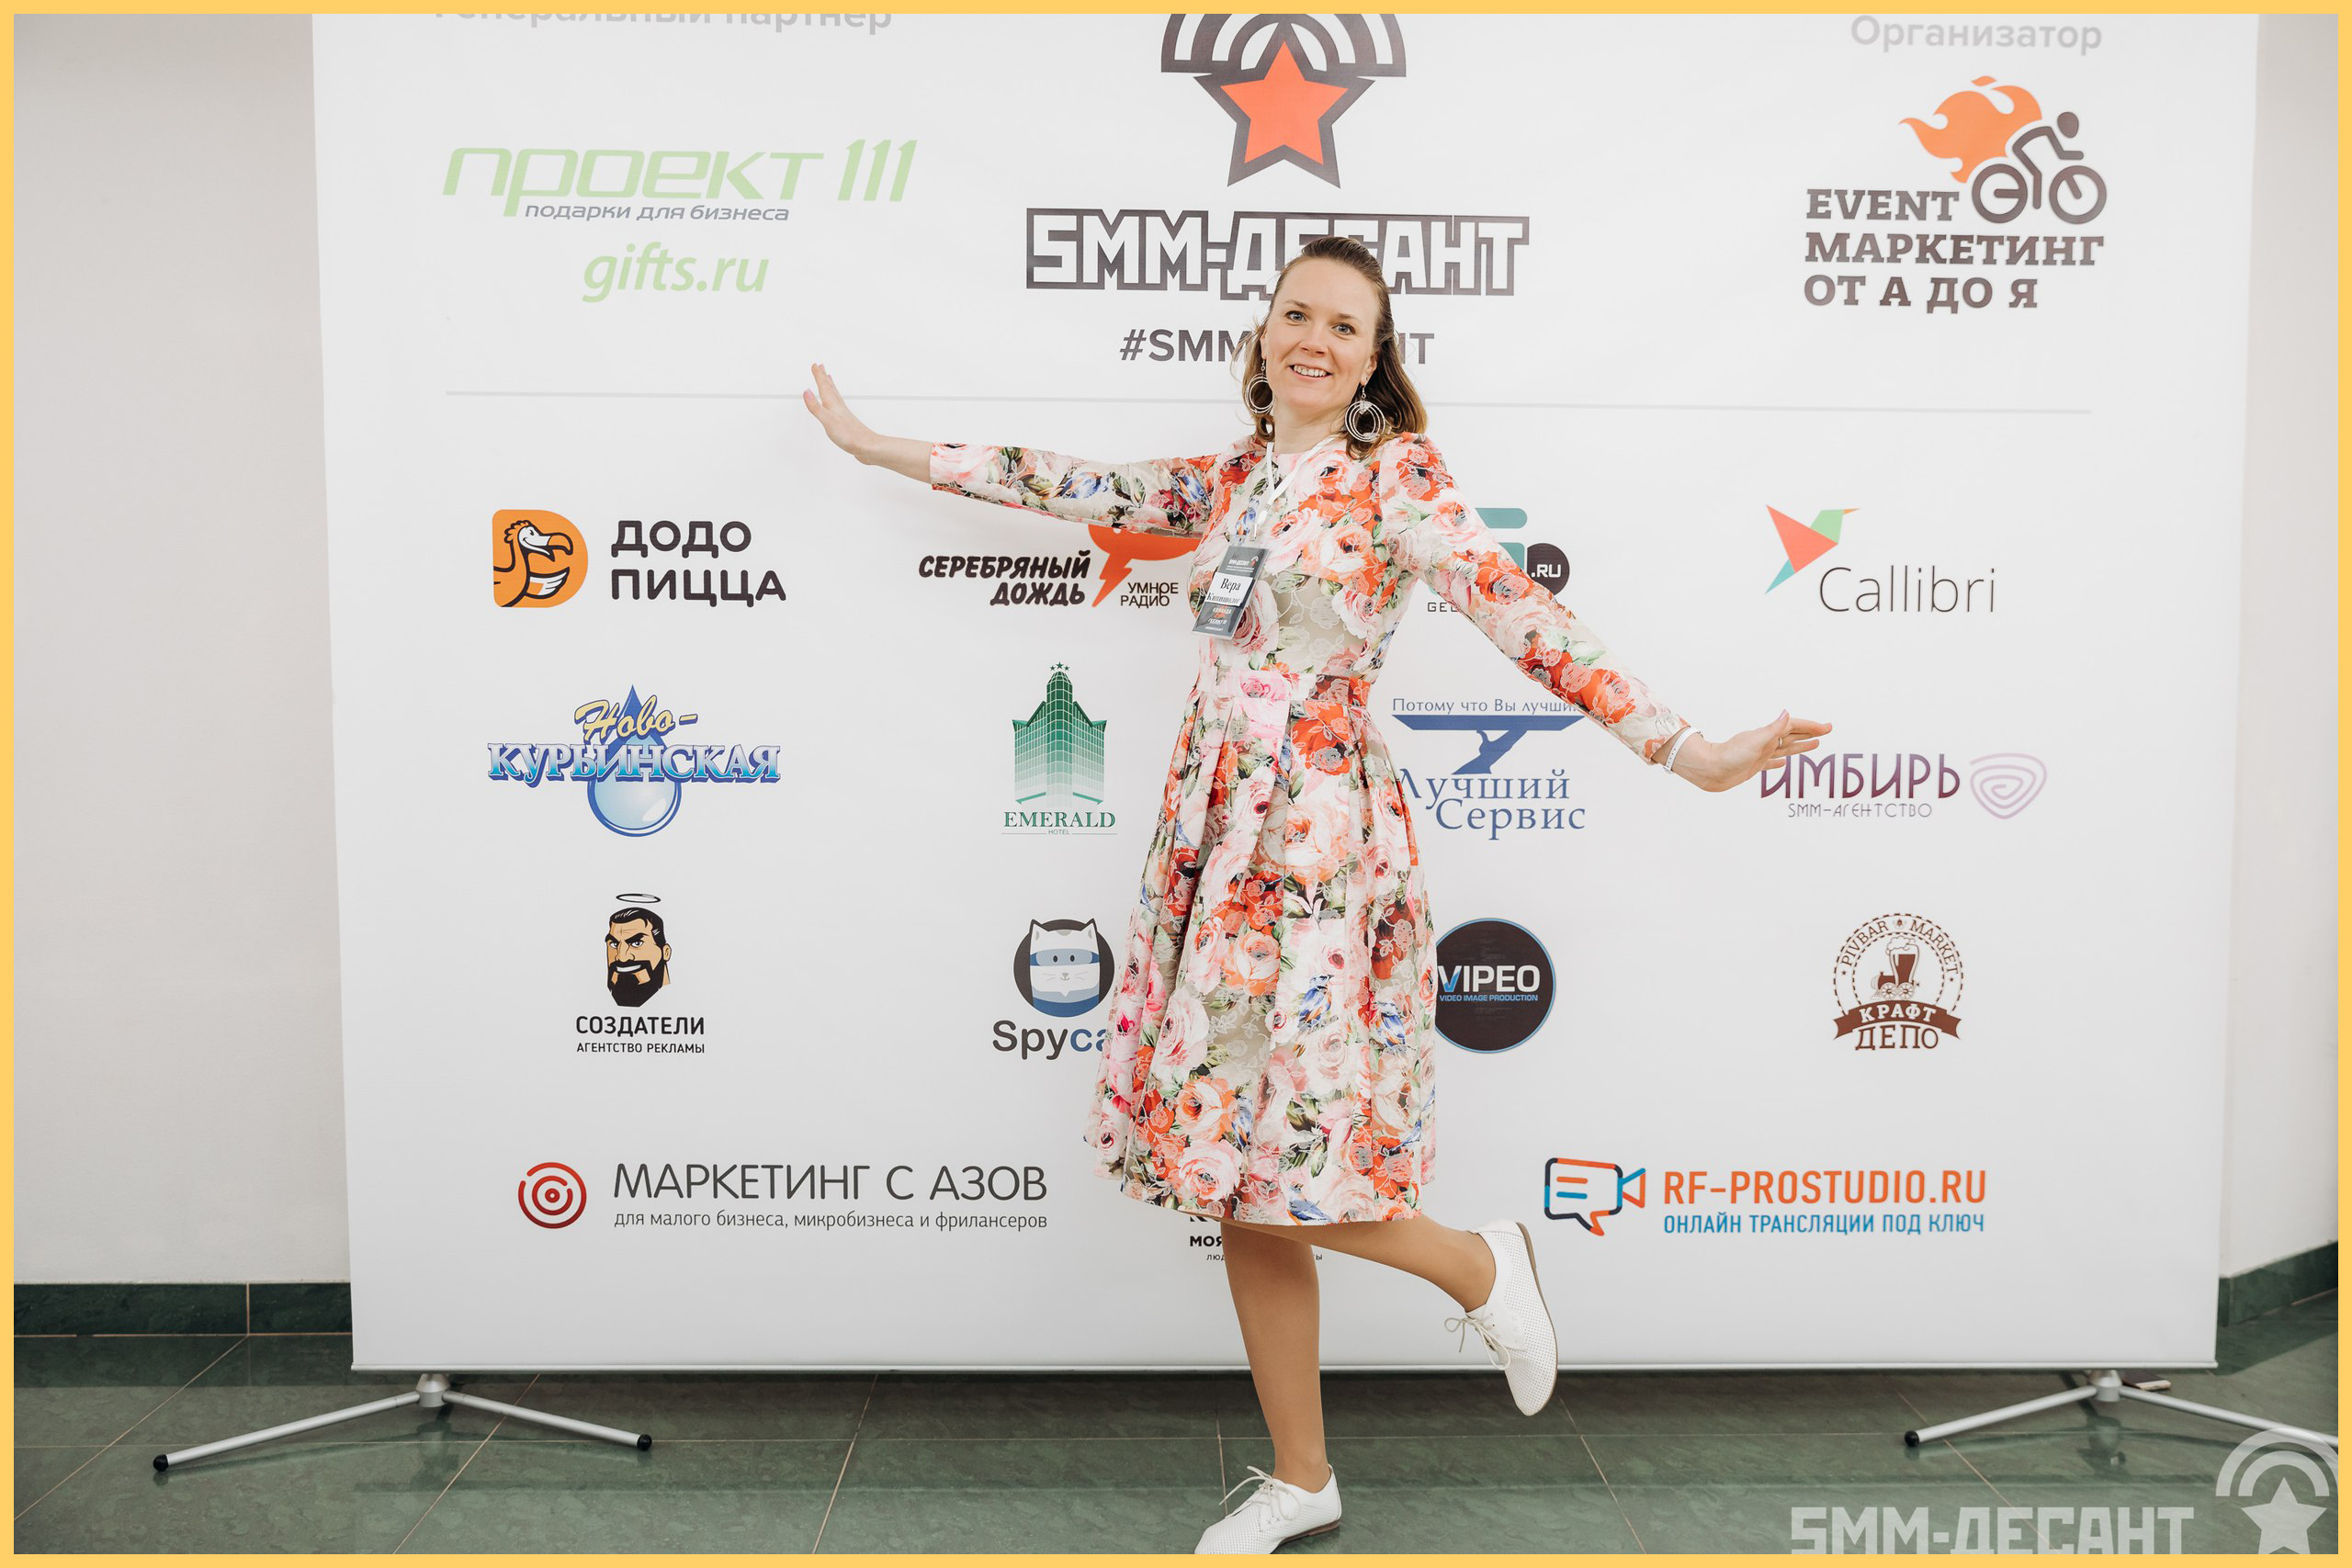 Вера Бойко, Екатеринбург, SMM-десант: Урал 2018